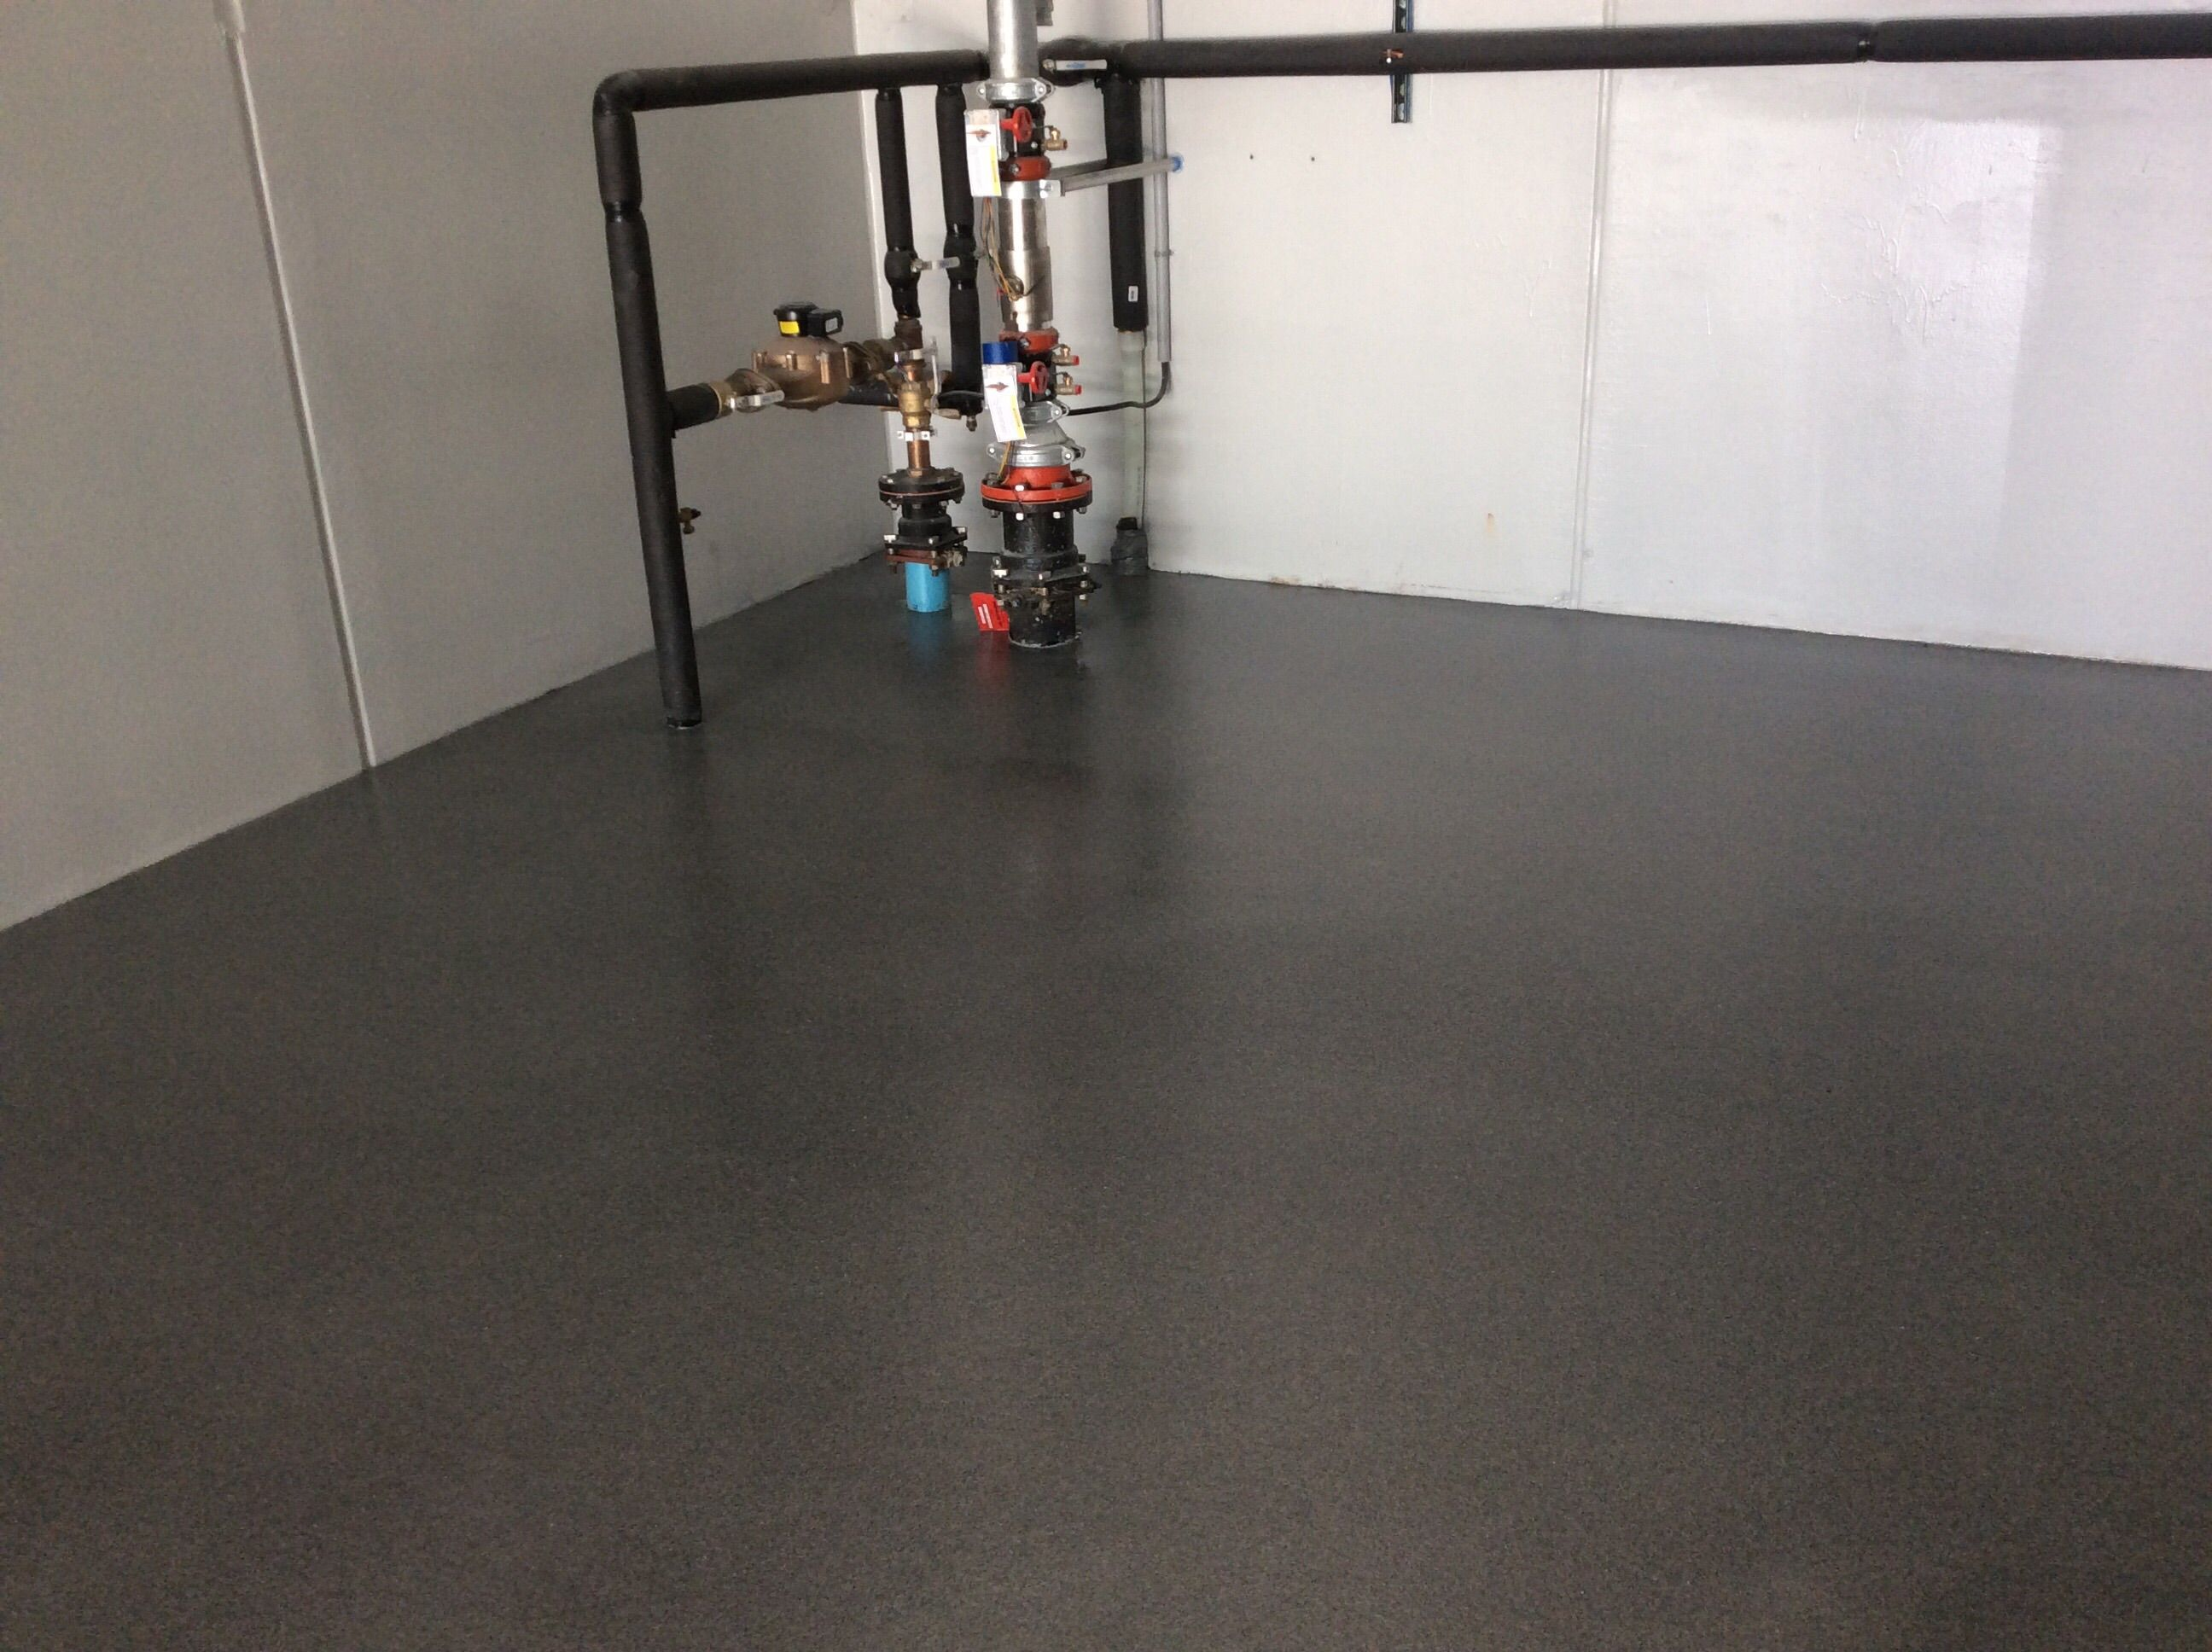 Classic Silver Spring Polyaspartic Epoxy Garage Floor Garage Floor Coatings Garage Floor Epoxy Epoxy Garage Floor Coating